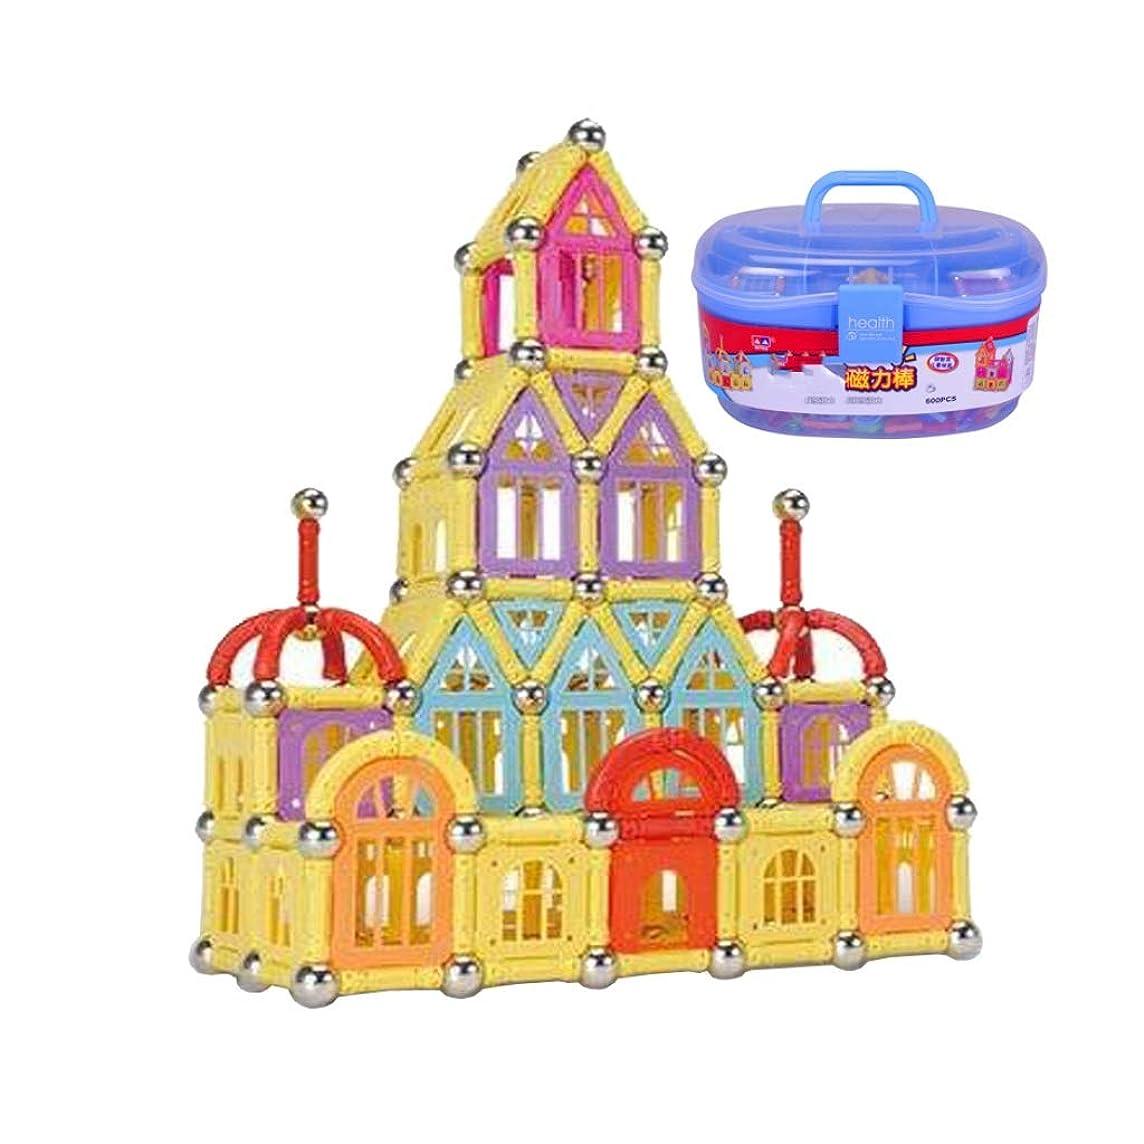 Yingjianjun A Set of 108 Magnetic Building Blocks, Children's Magnetic Toy Building Stacking Kit, Building Tile Block Creative Educational Toys